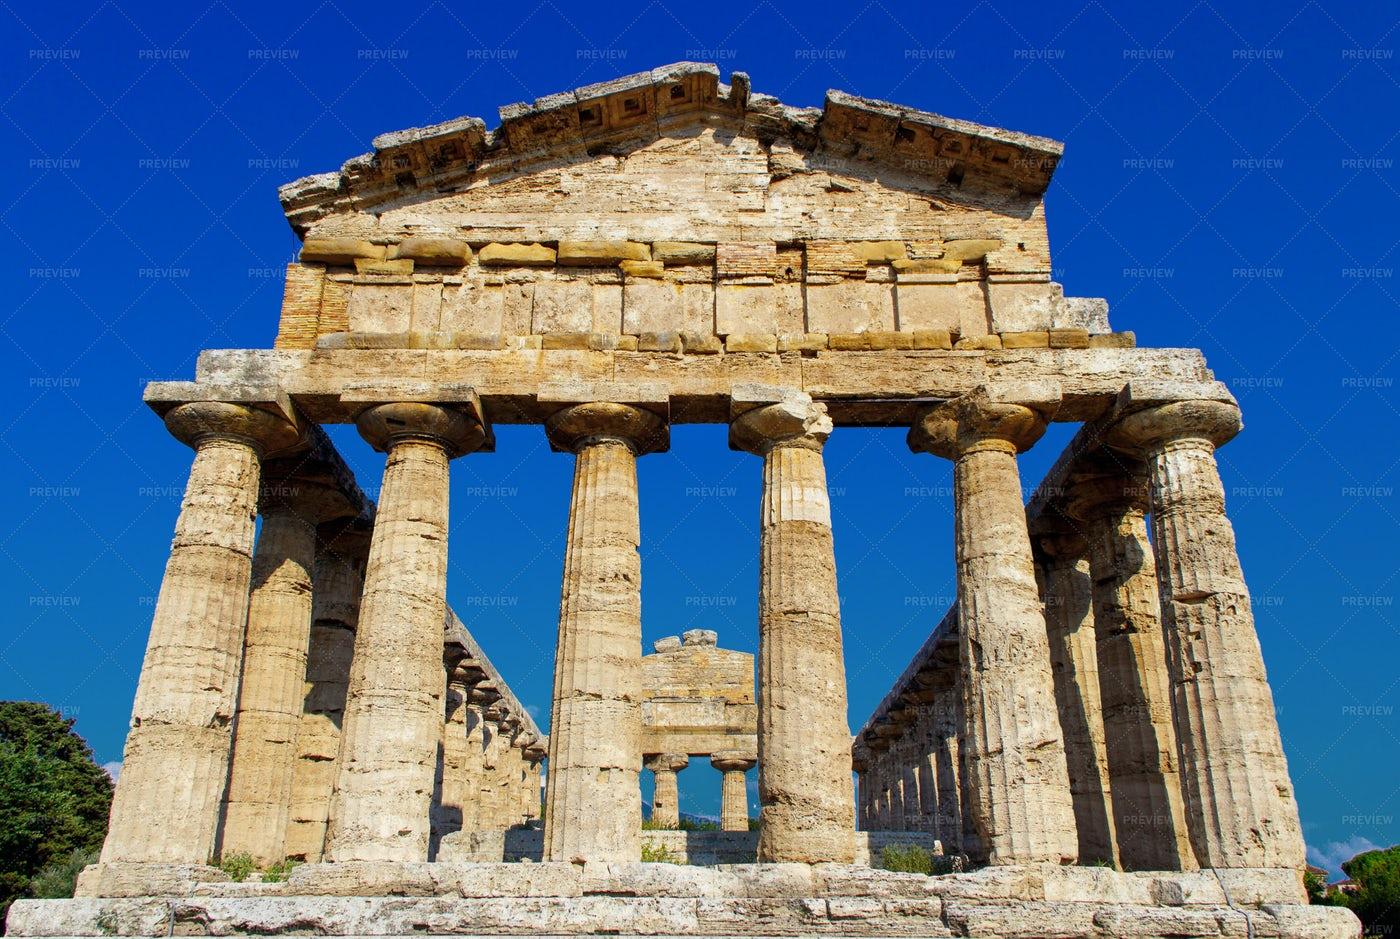 Greek Temple In Paestum, Italy: Stock Photos